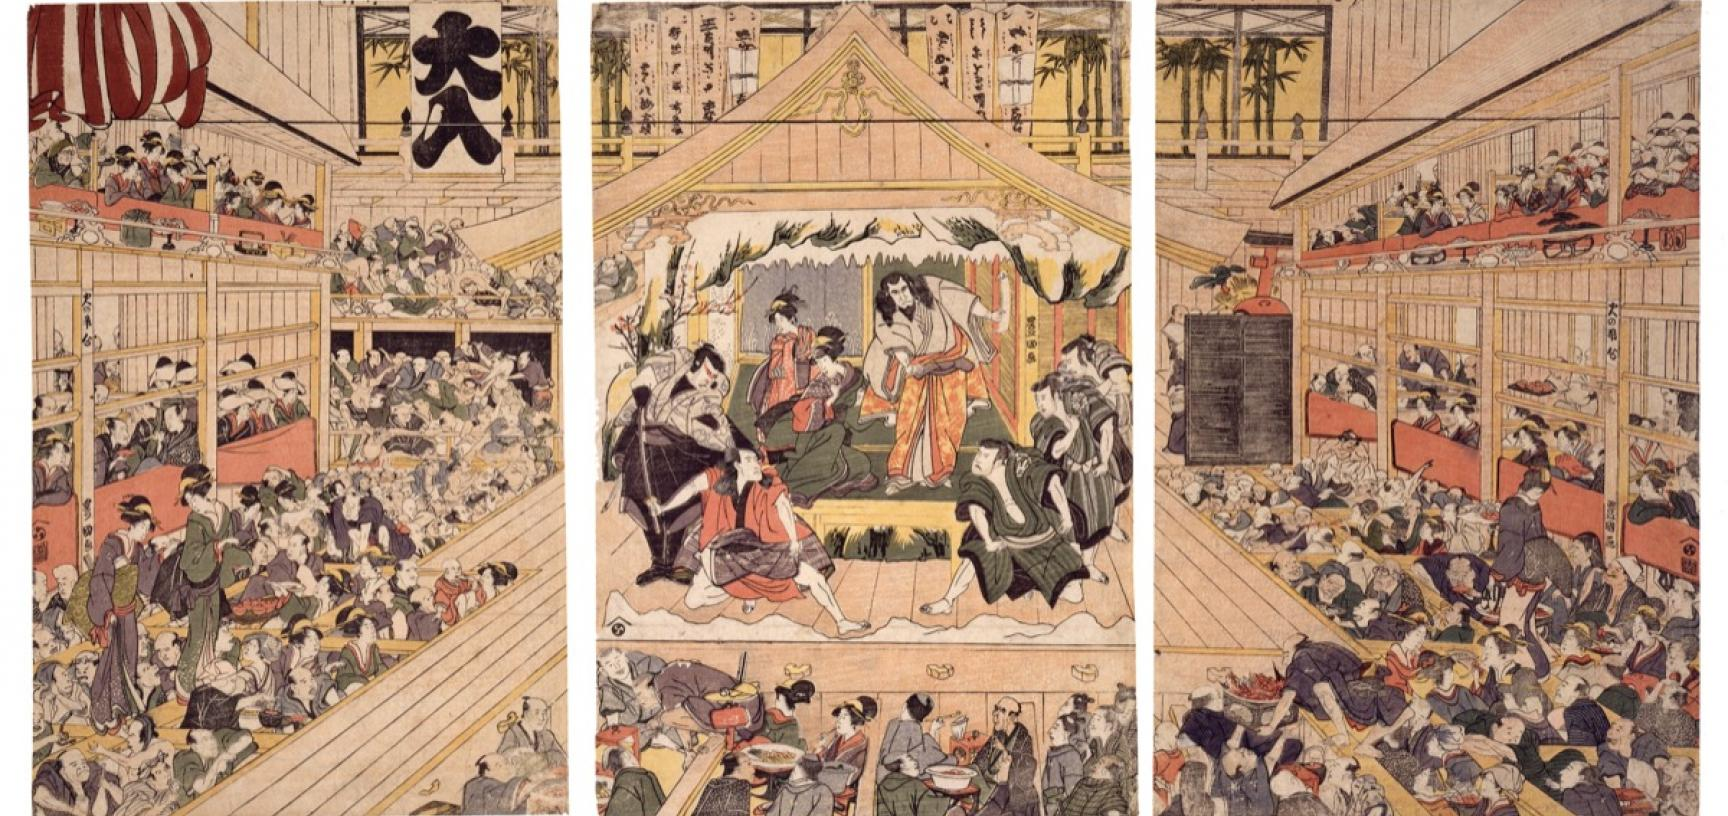 Woodblock print by artist Utagawa Toyokuni I showing the interior of the Nakamura-za theatre in Edo, 1800.